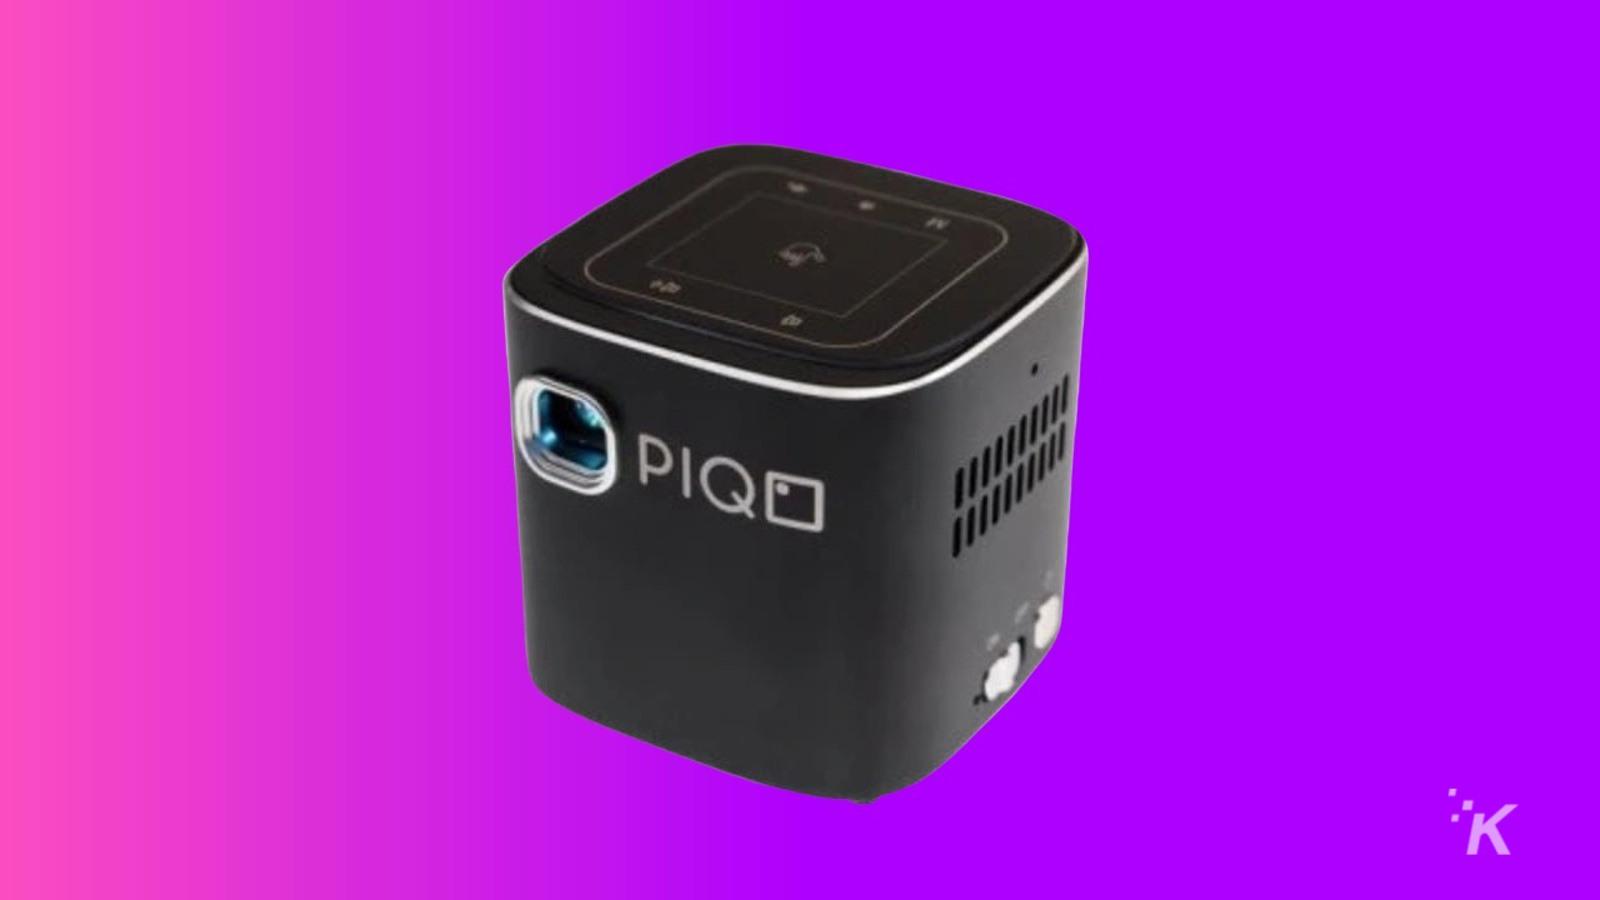 piqo projector black friday